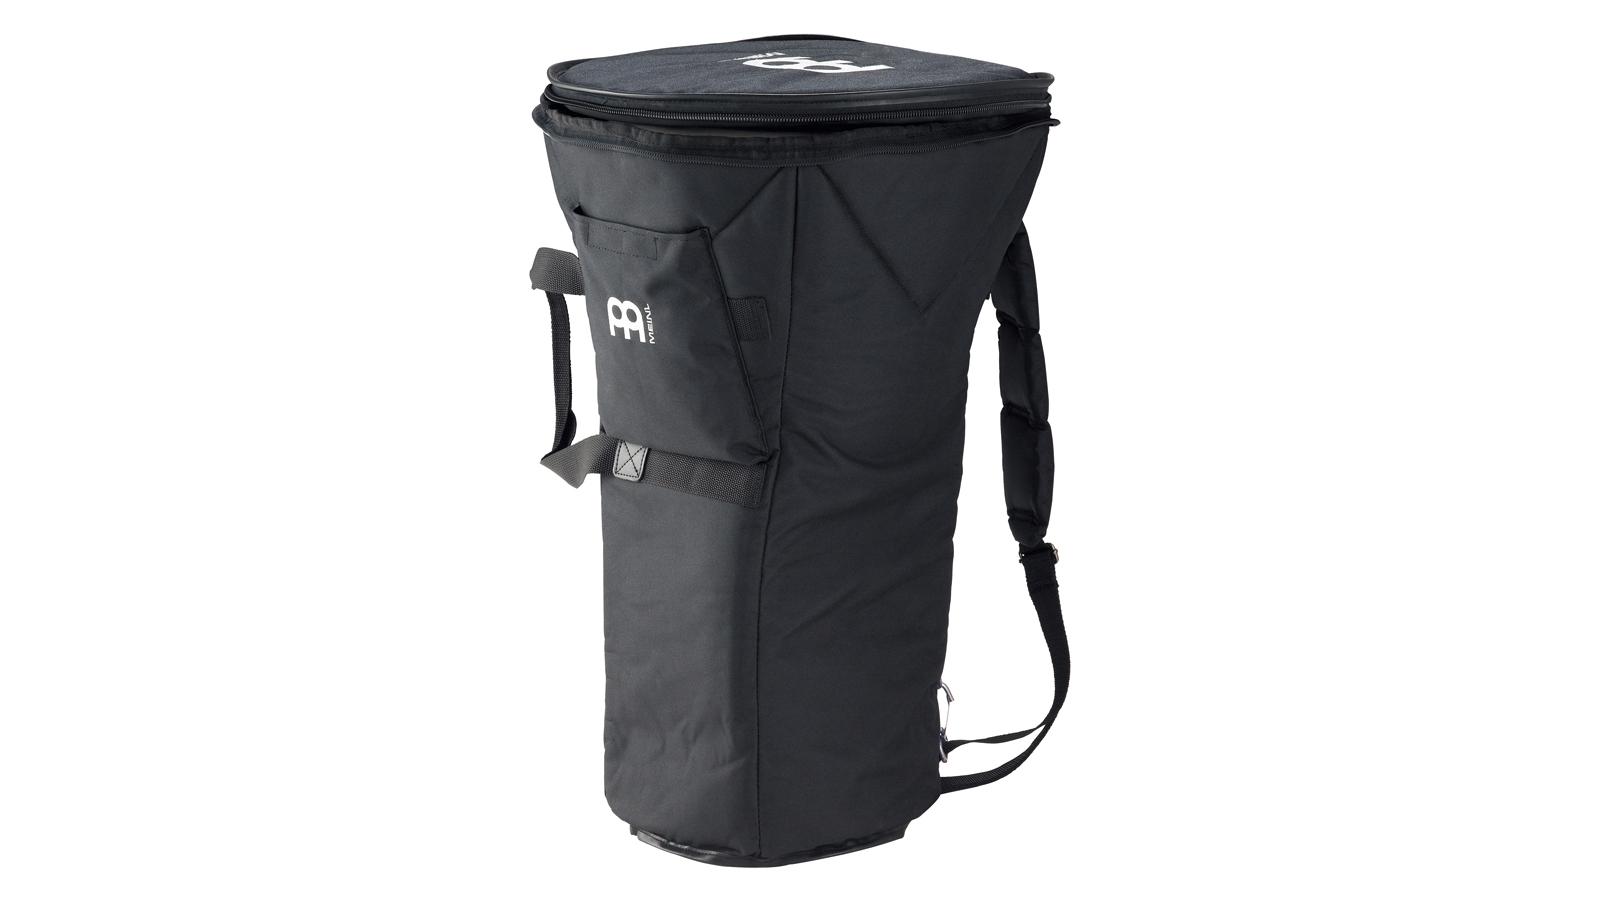 Meinl MDJB-L Professional Djembe Bag large